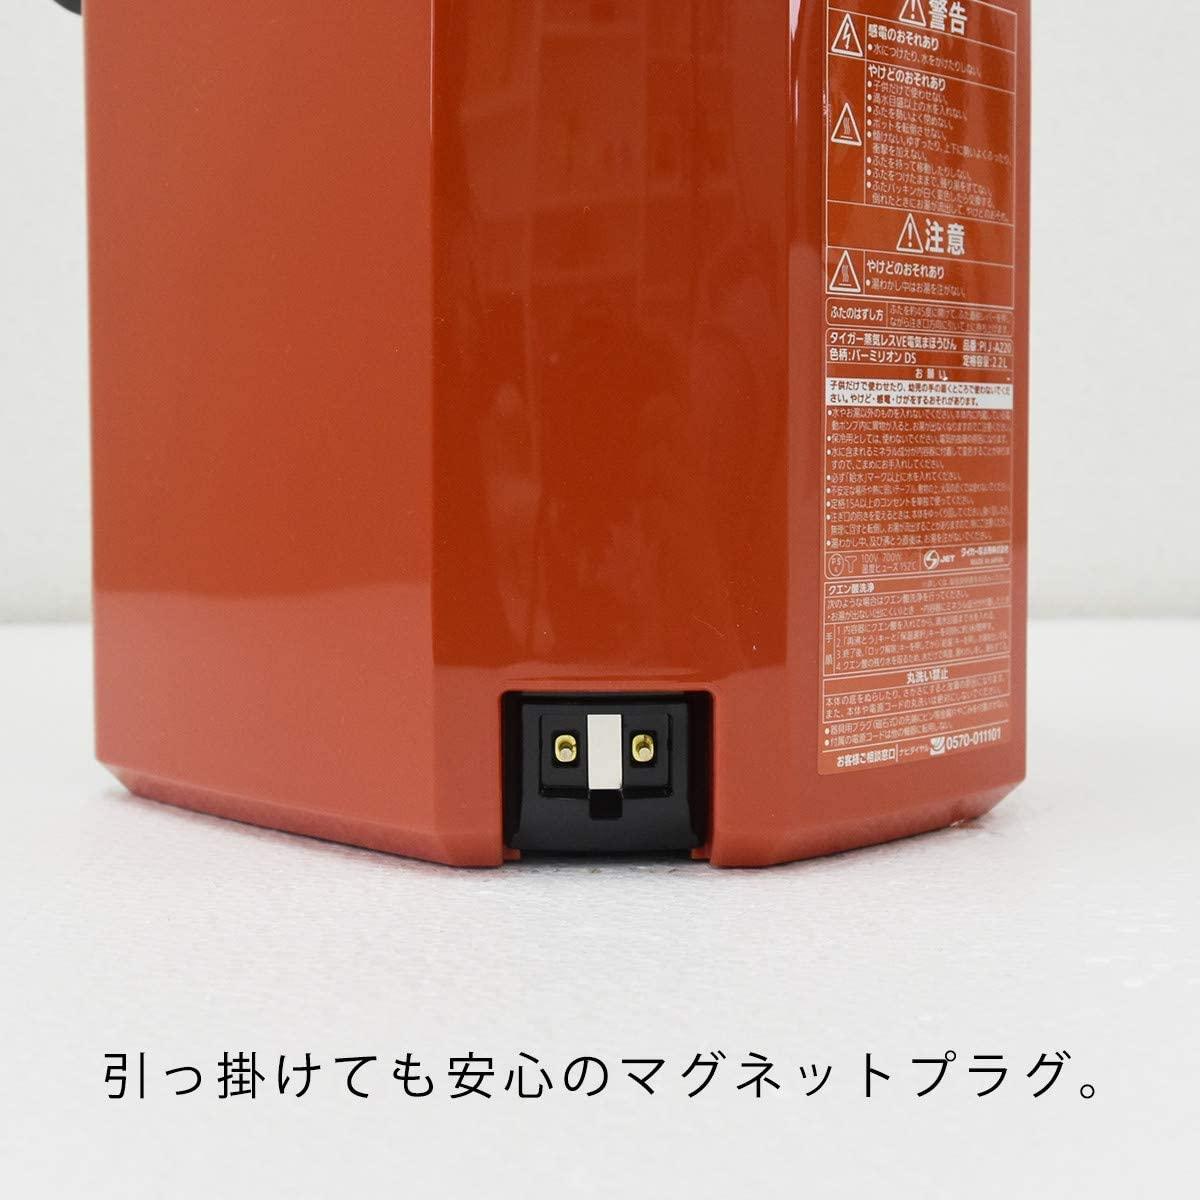 TIGER(タイガー)蒸気レスVE電気まほうびん PIJ-A220の商品画像6